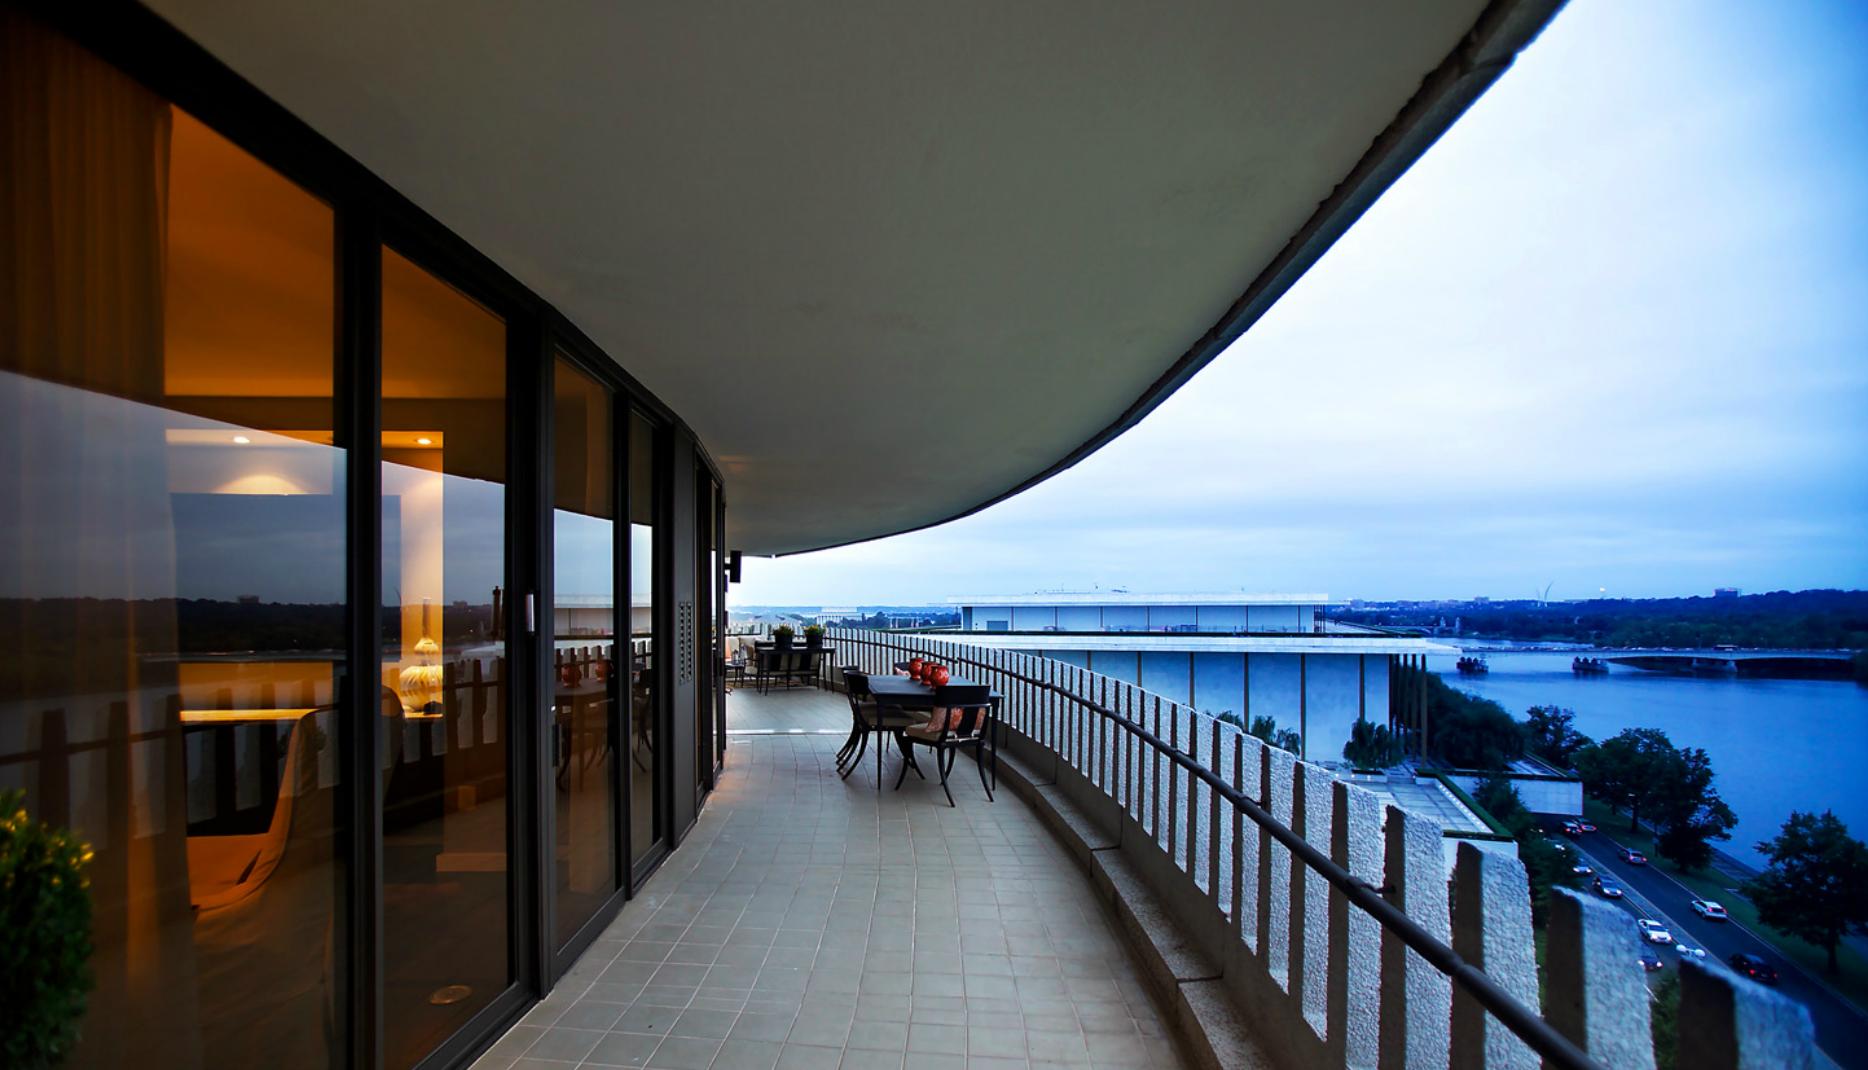 Dc Luxury Real Estate Stages Comeback Ttr Sotheby S